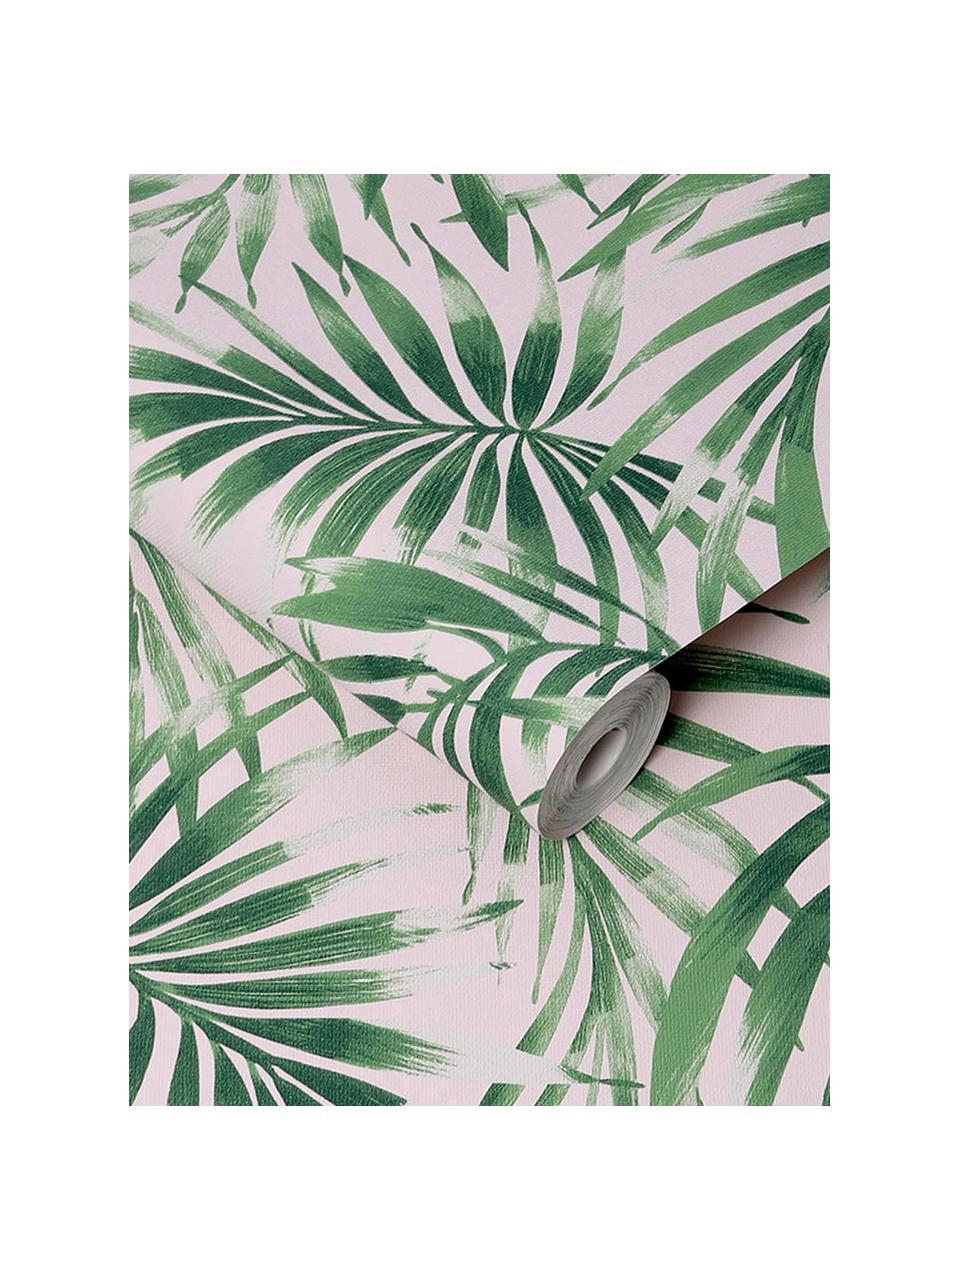 Tapete Leaves Blush, Vlies, Grün, Rosa, 52 x 1005 cm